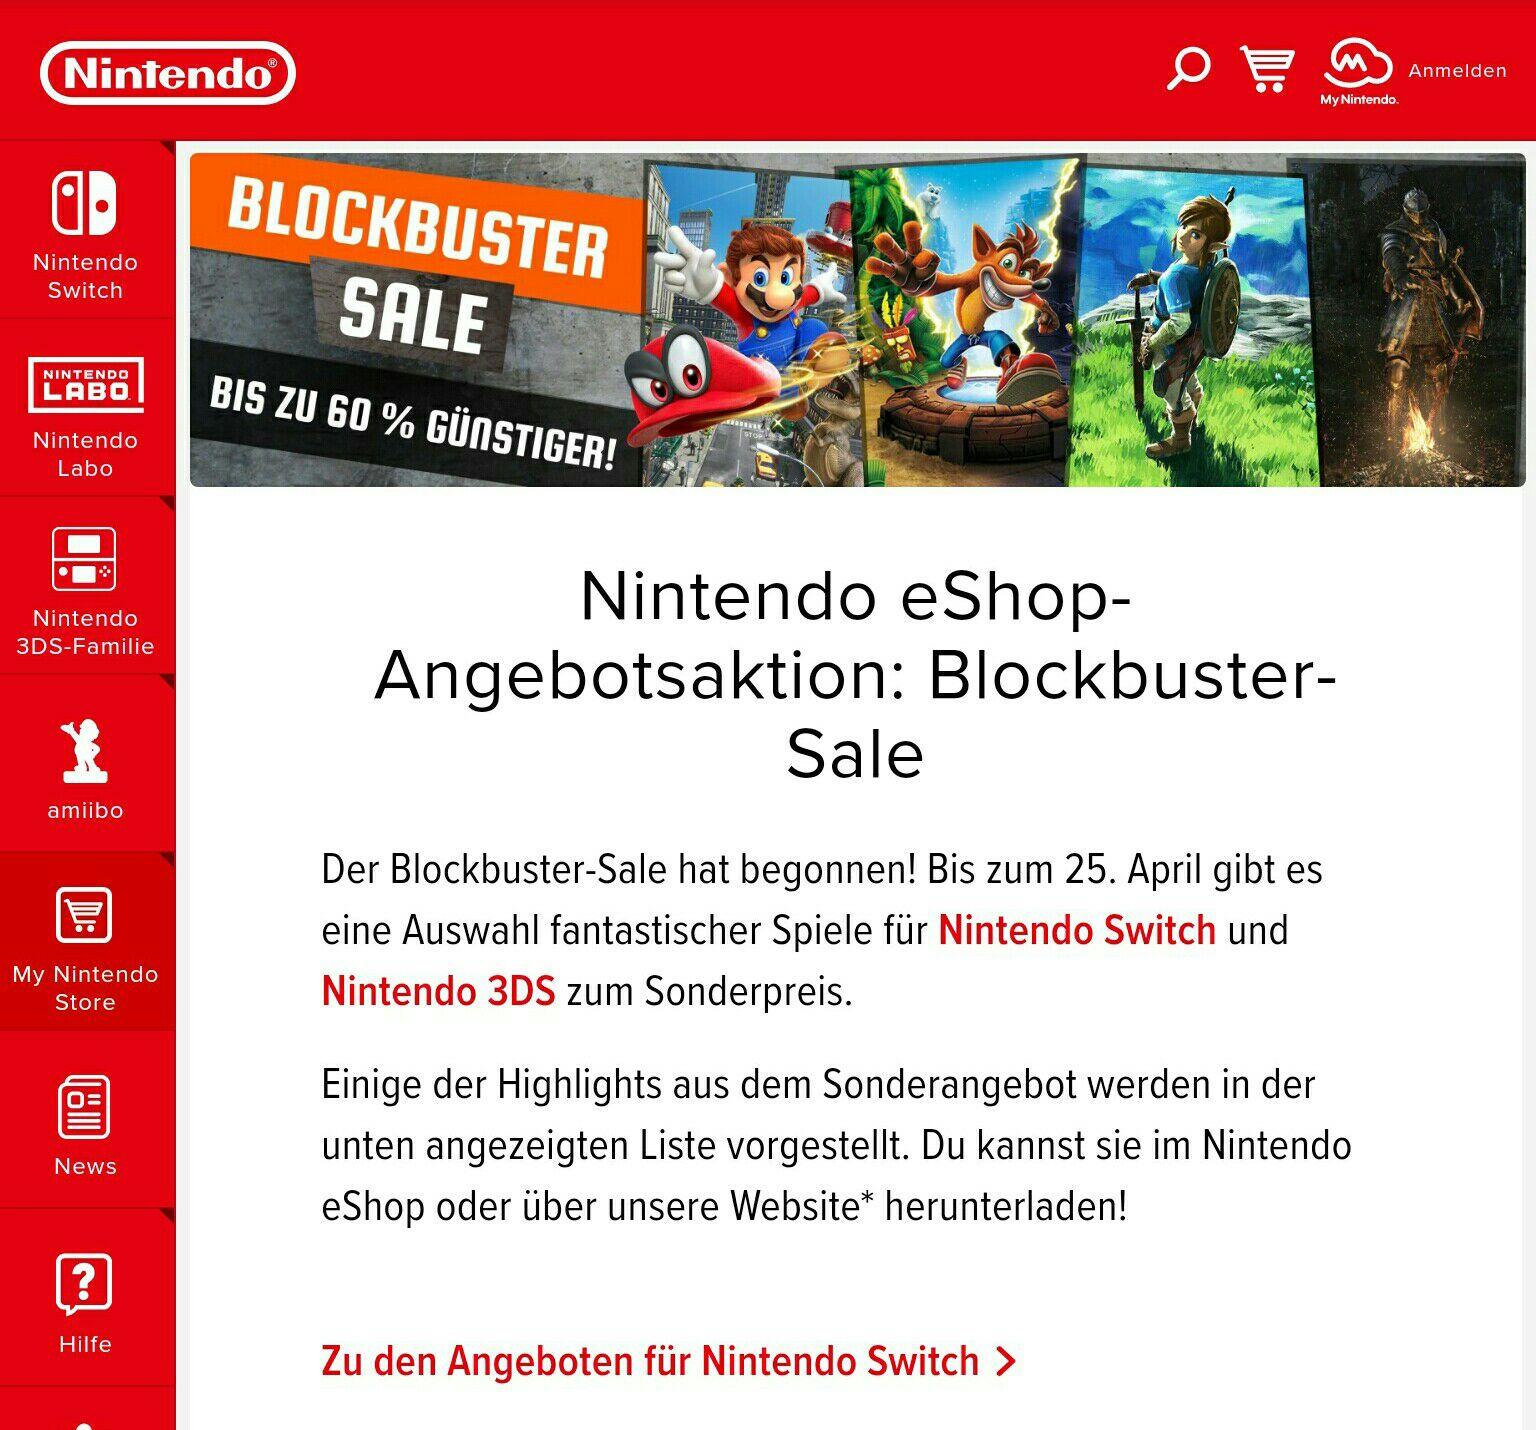 Nintendo eShop-Angebotsaktion: Blockbuster-Sale